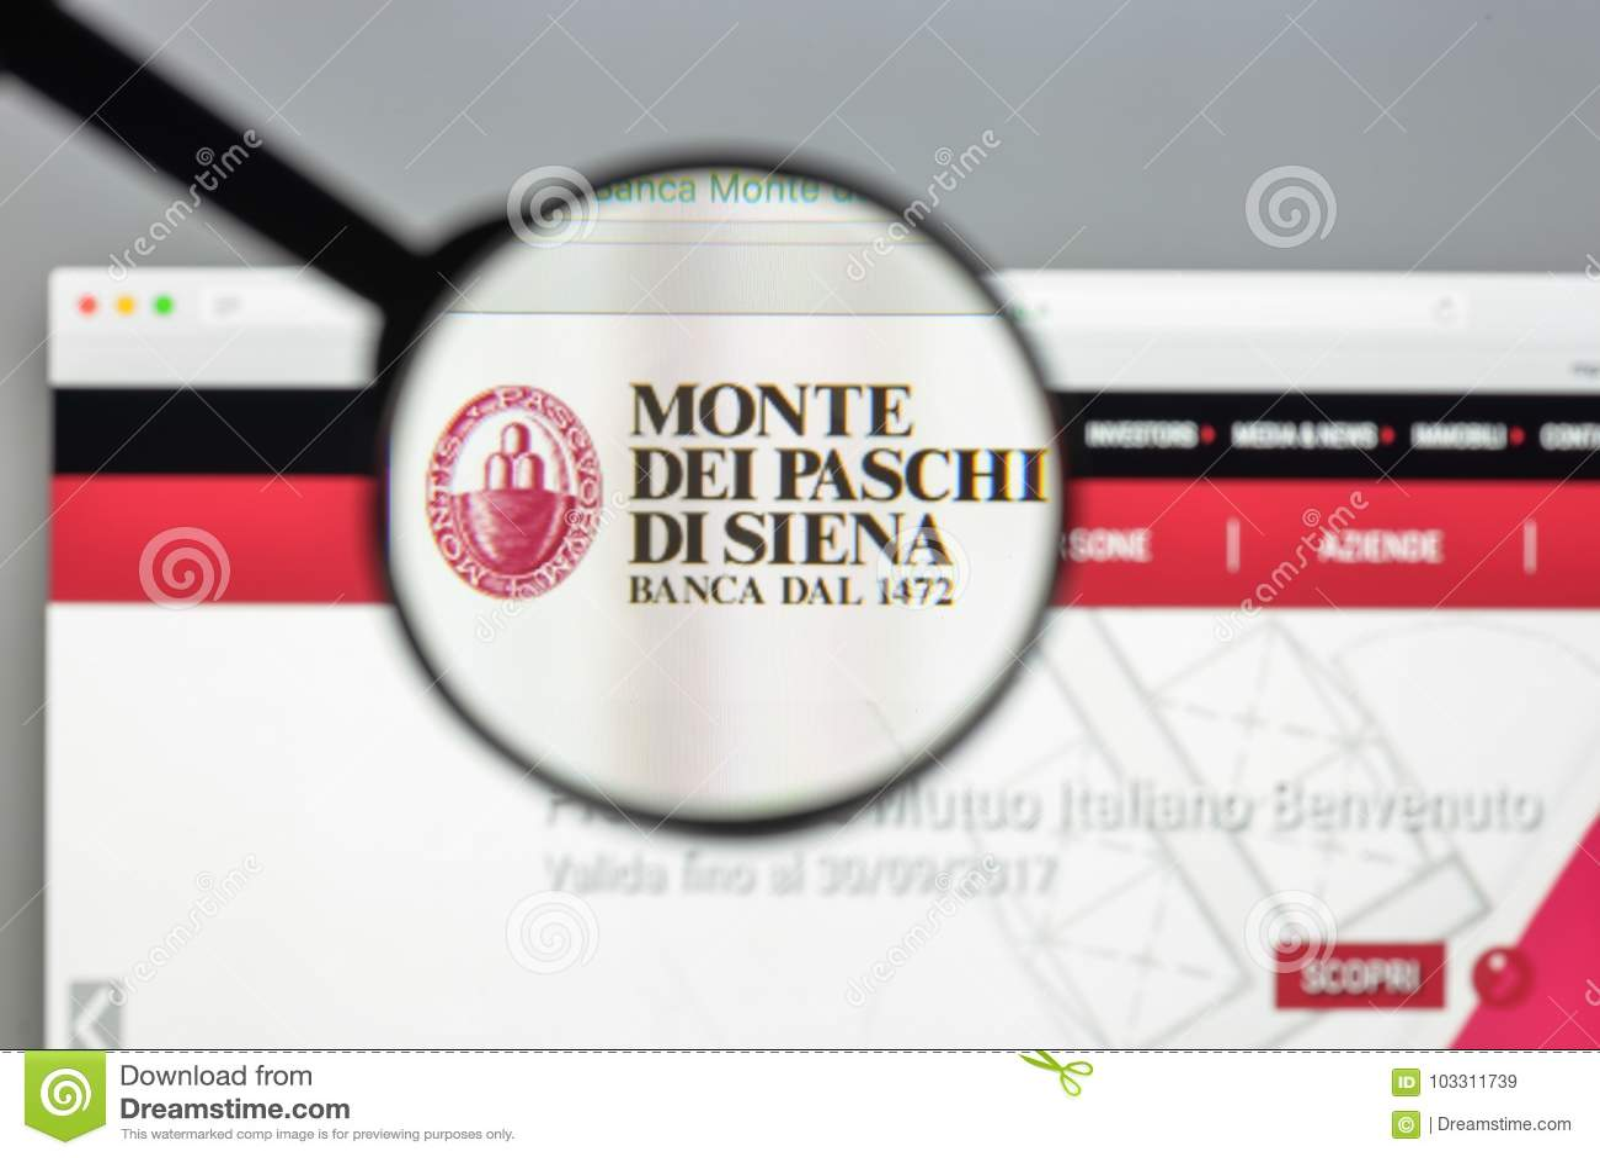 Milan Italy August 10 2017 Monte Dei Paschi Di Siena Bank W